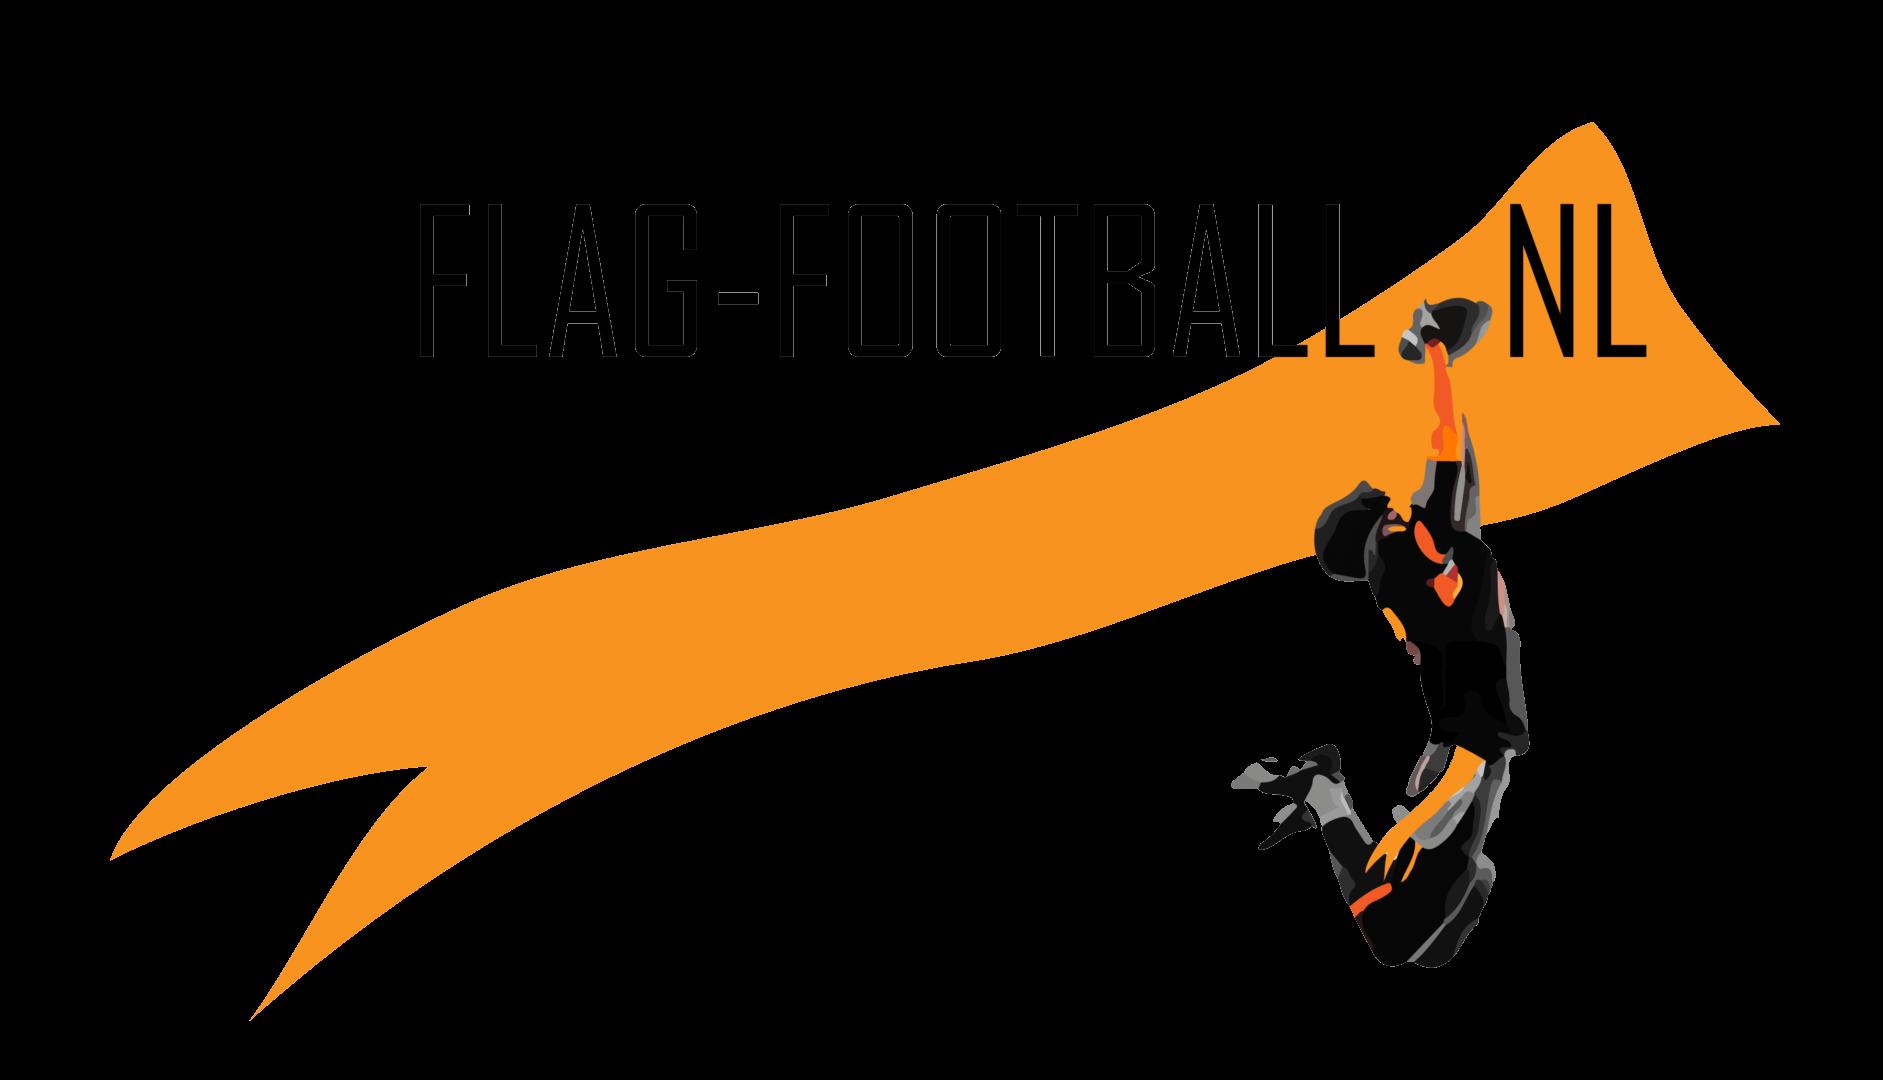 flagfootballnl_logo300 transparant